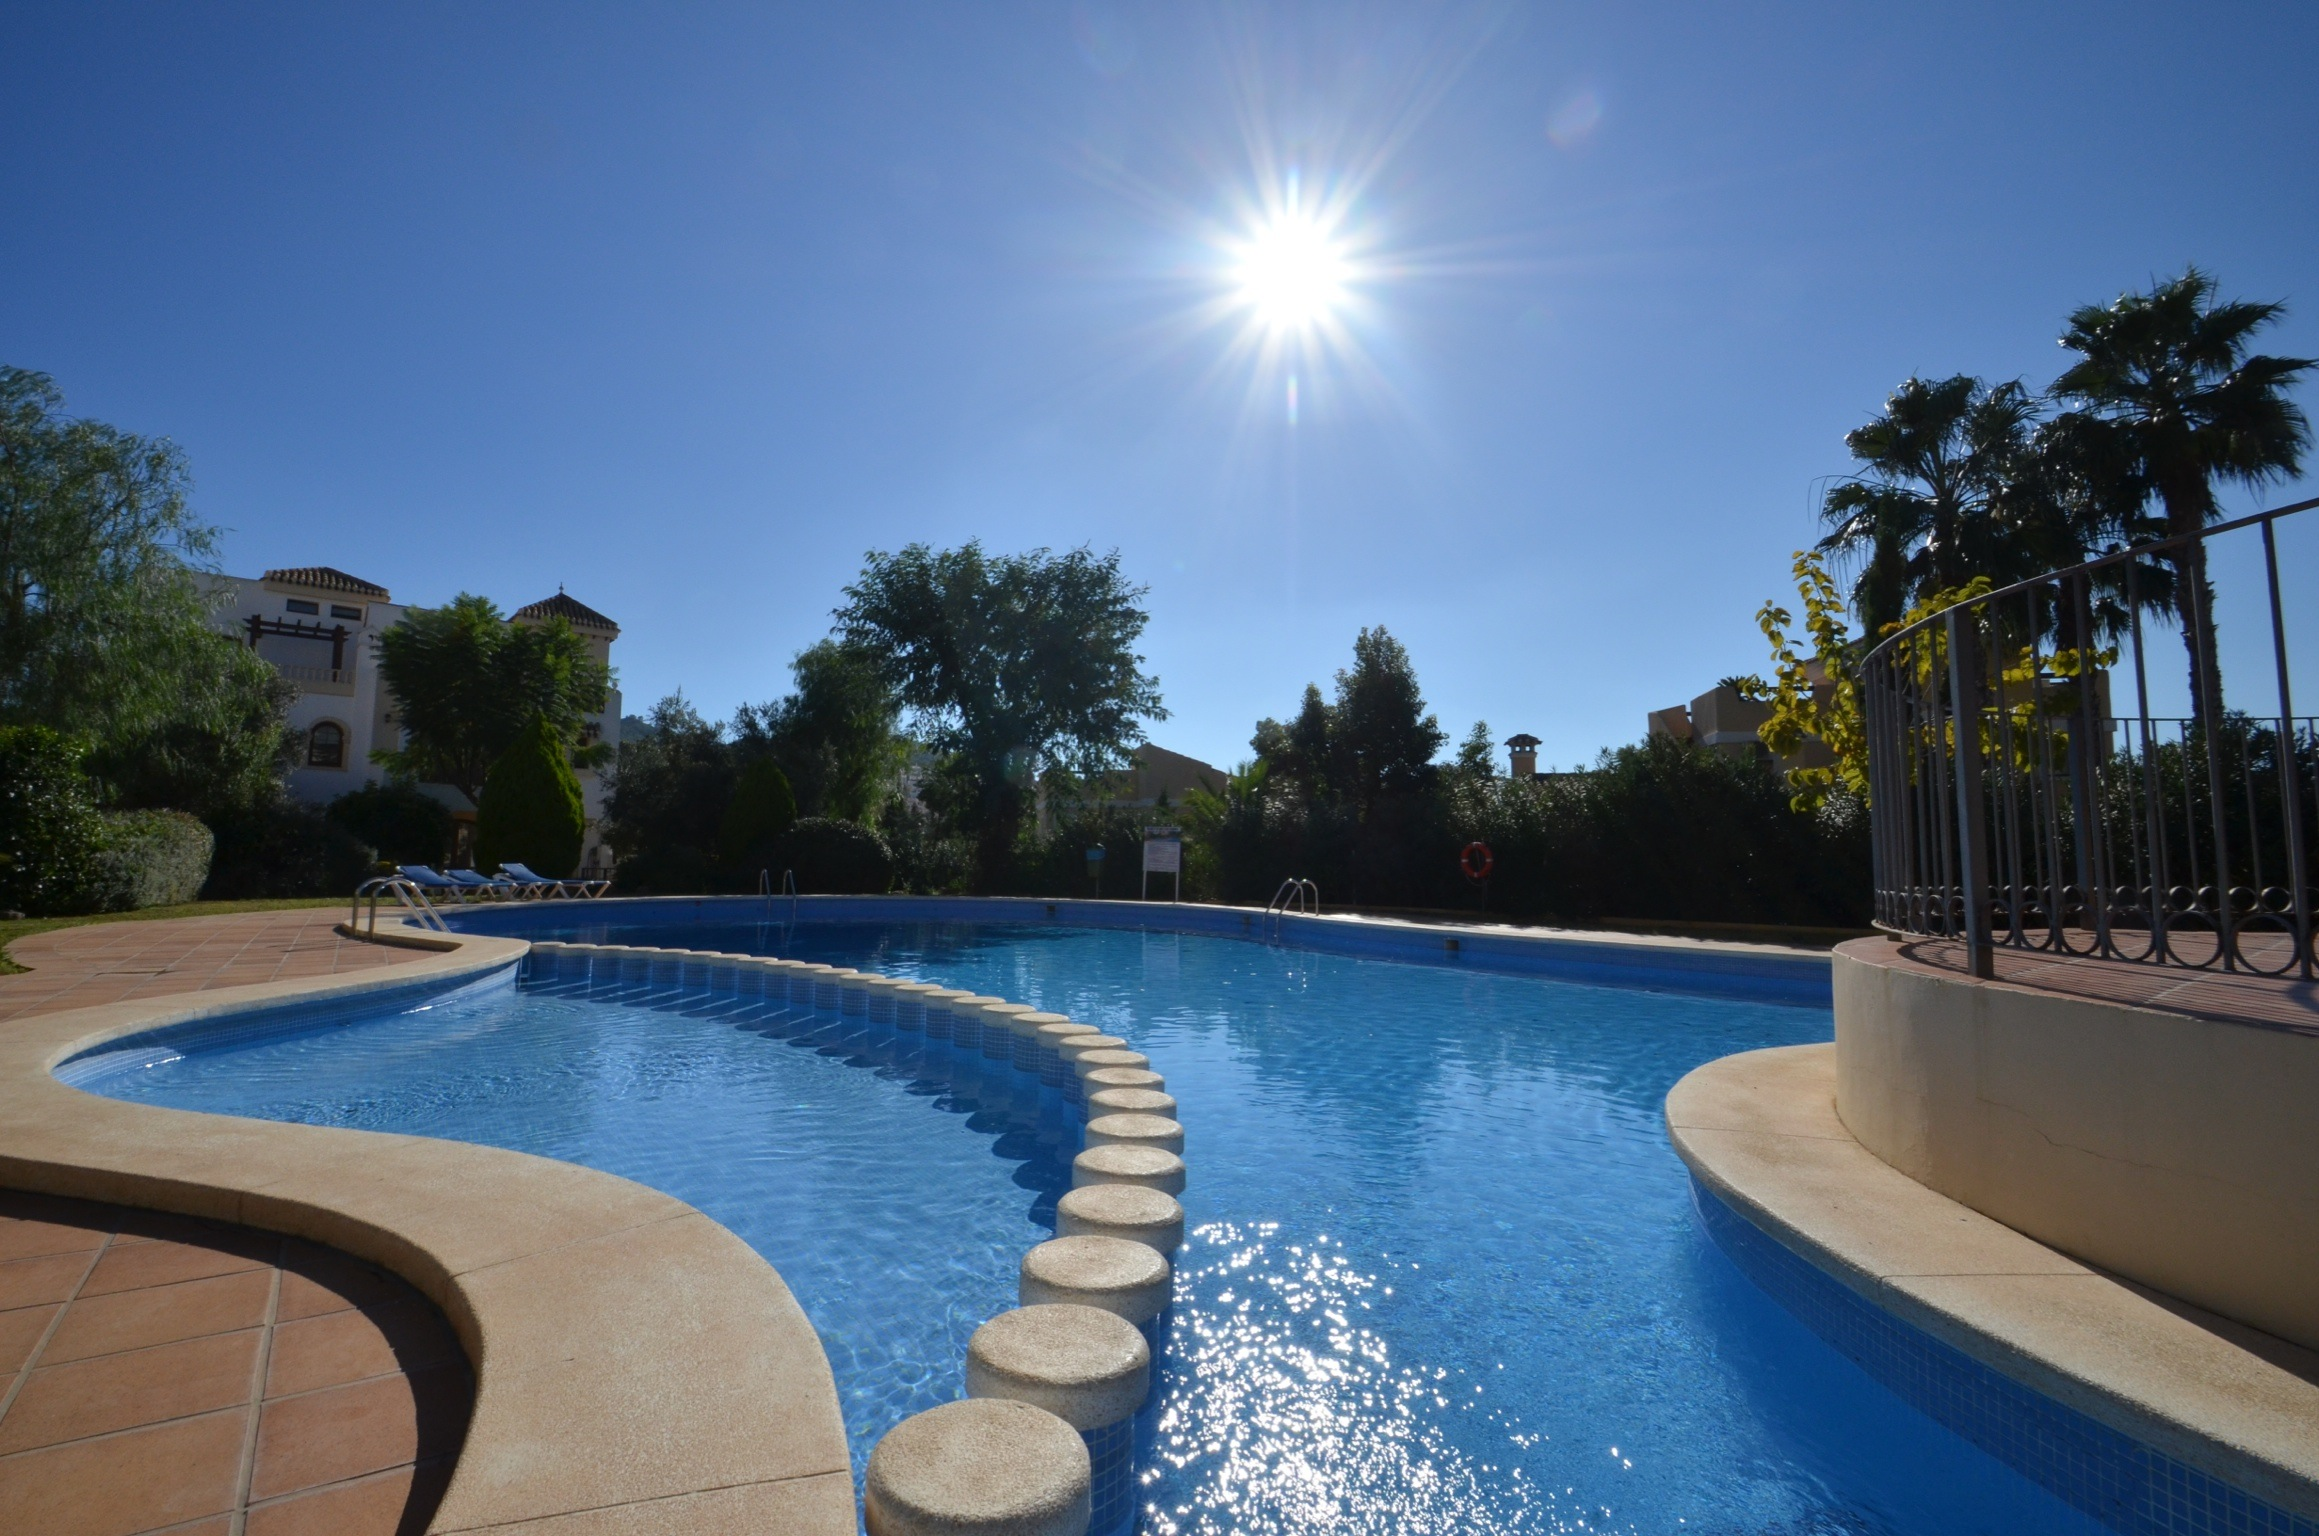 Monte Claro community pool